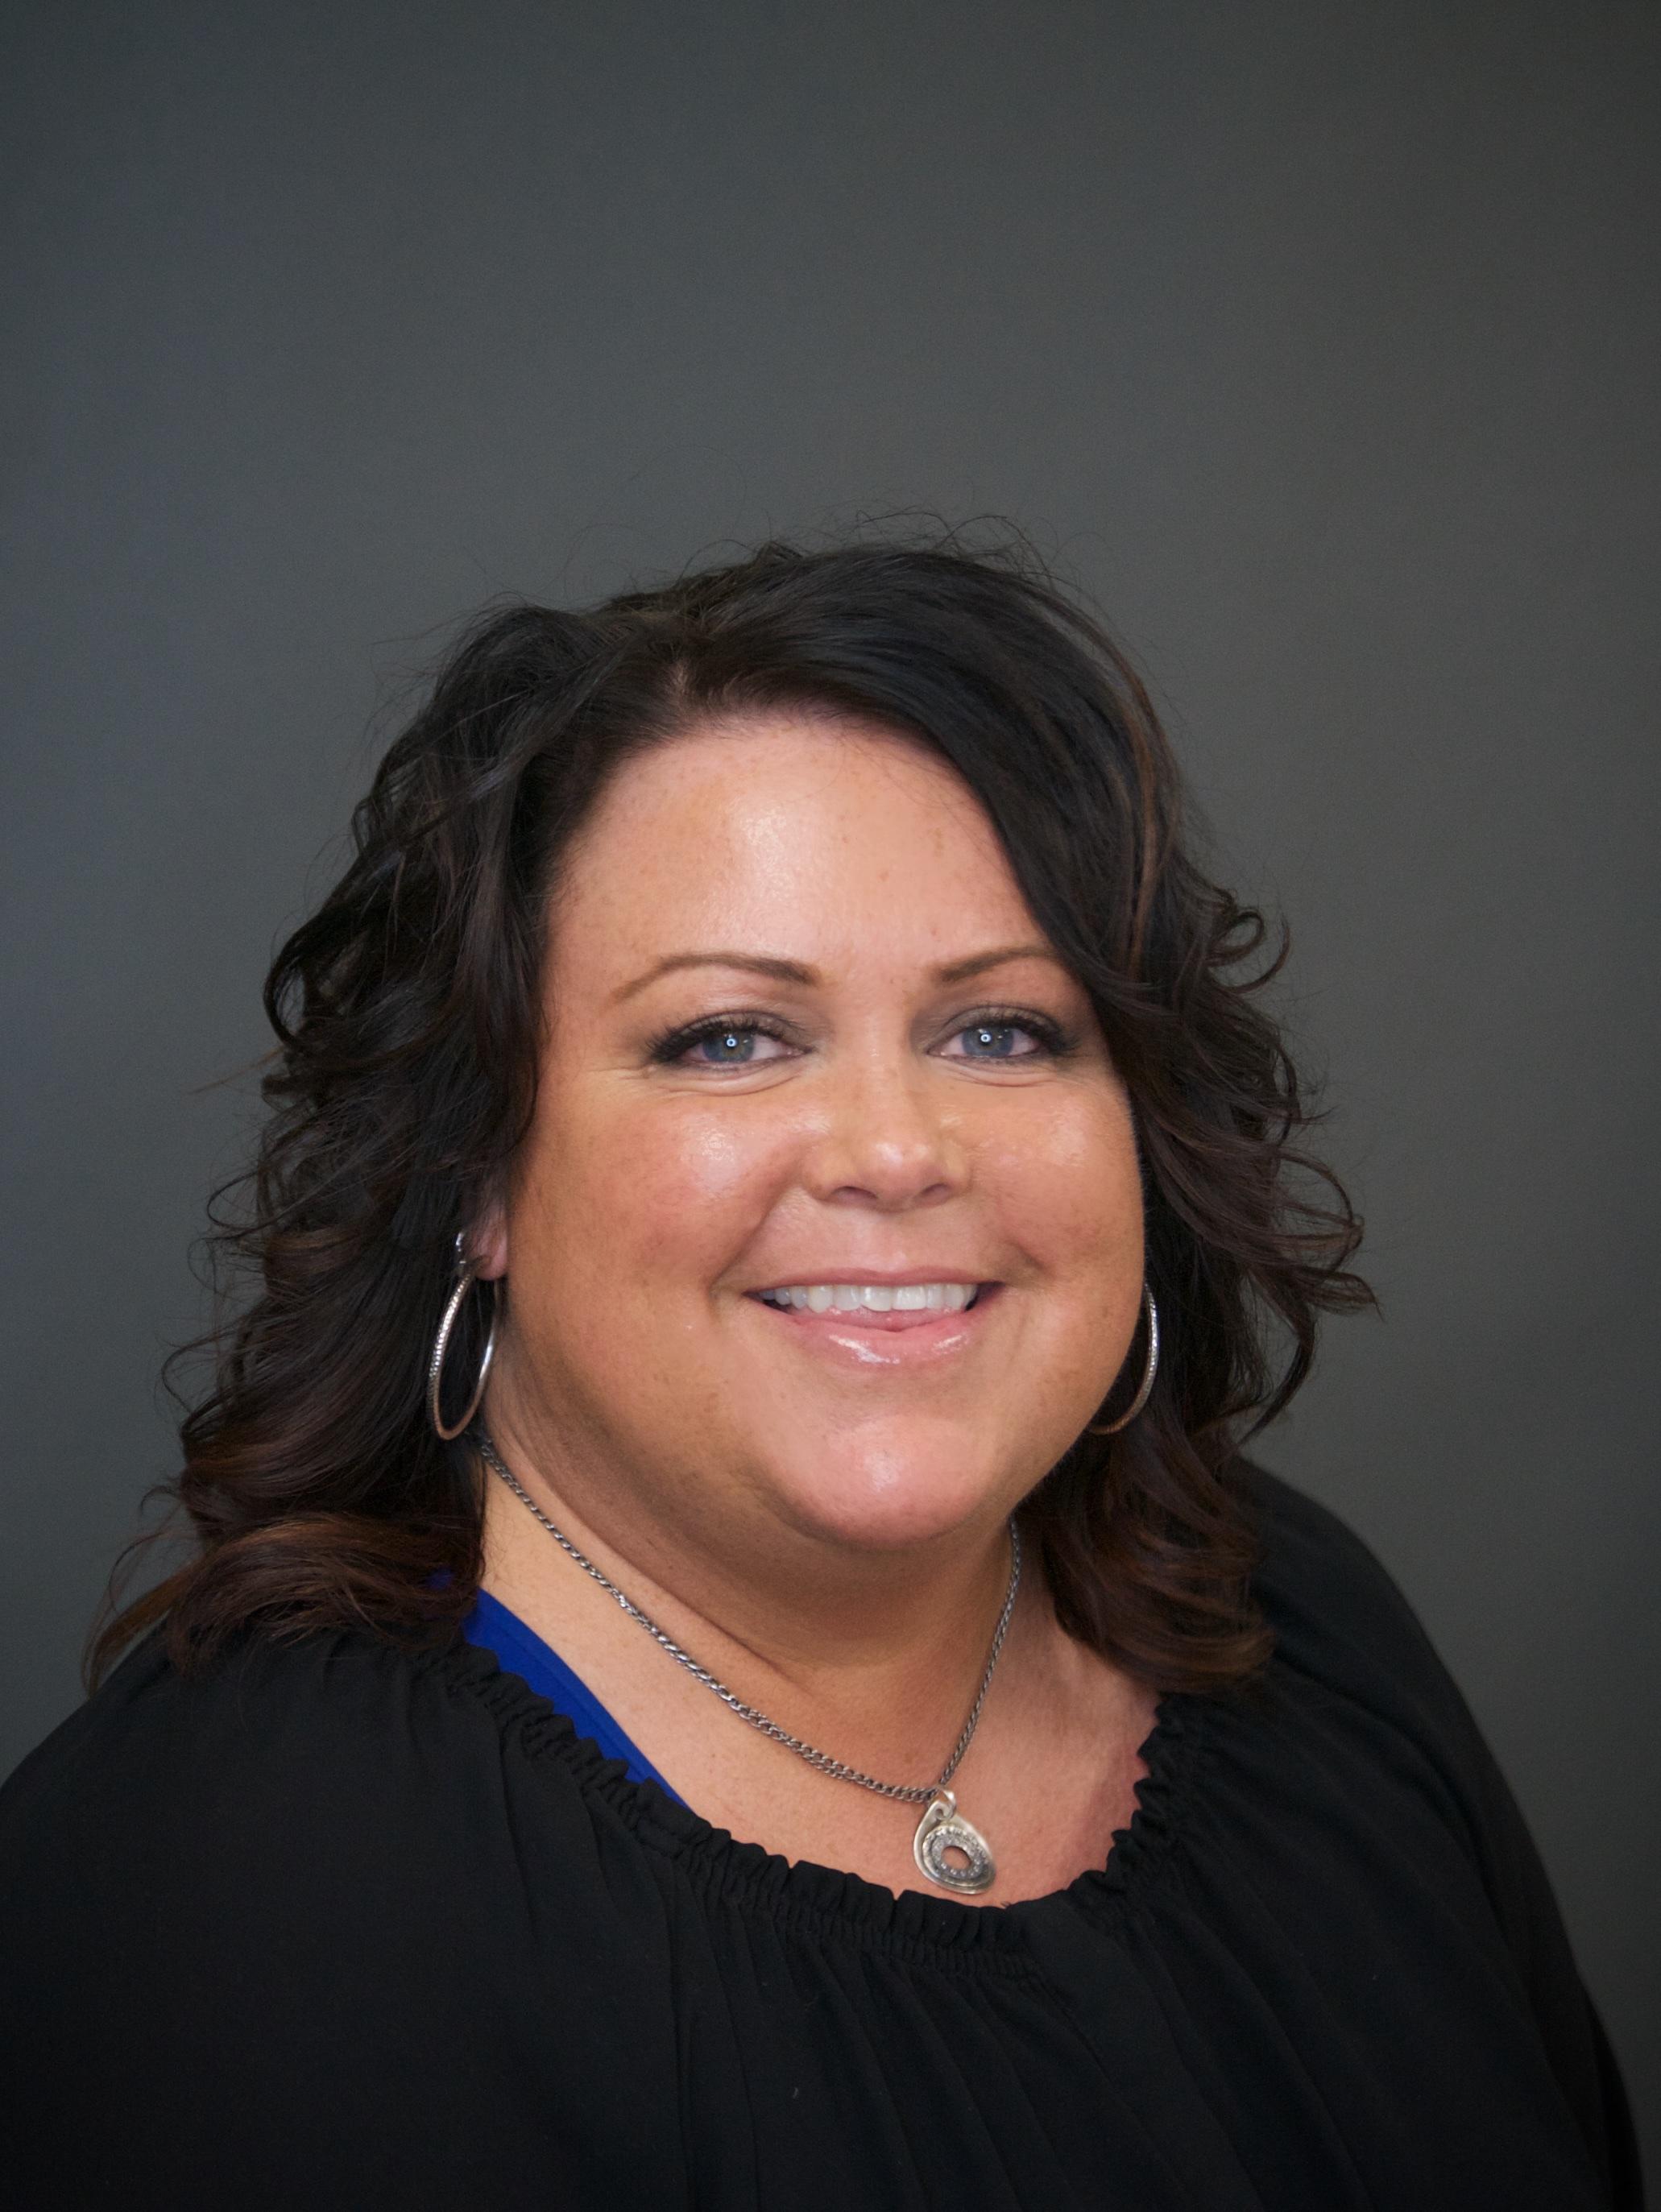 Anna-Lynn Brink<br/>Director of Community Services